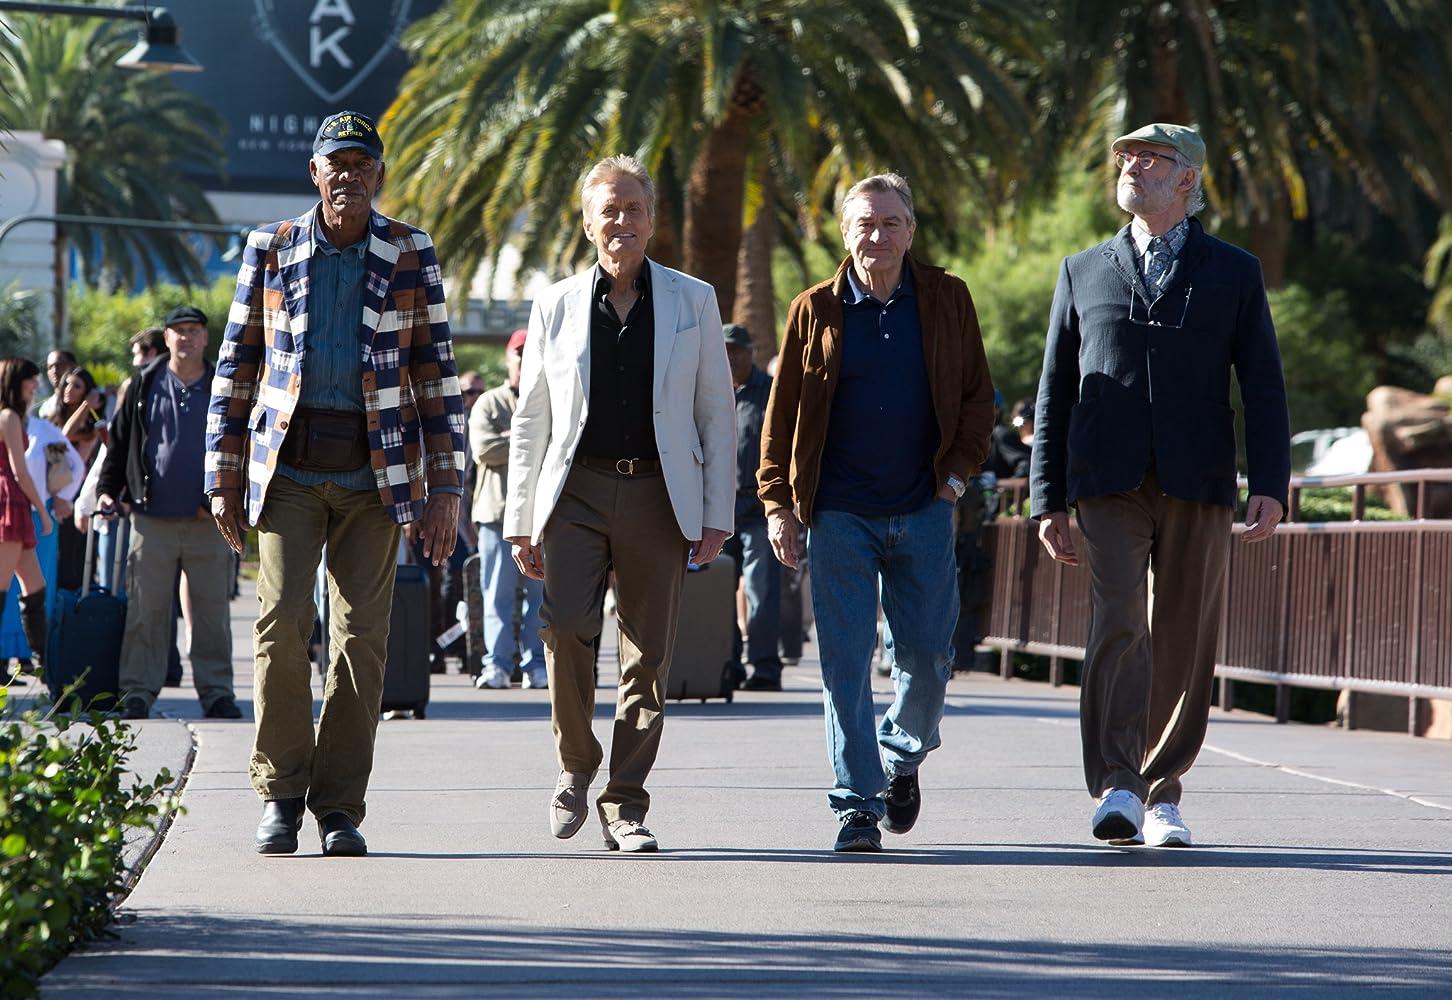 Ultimo viaje a las Vegas (Last Vegas)